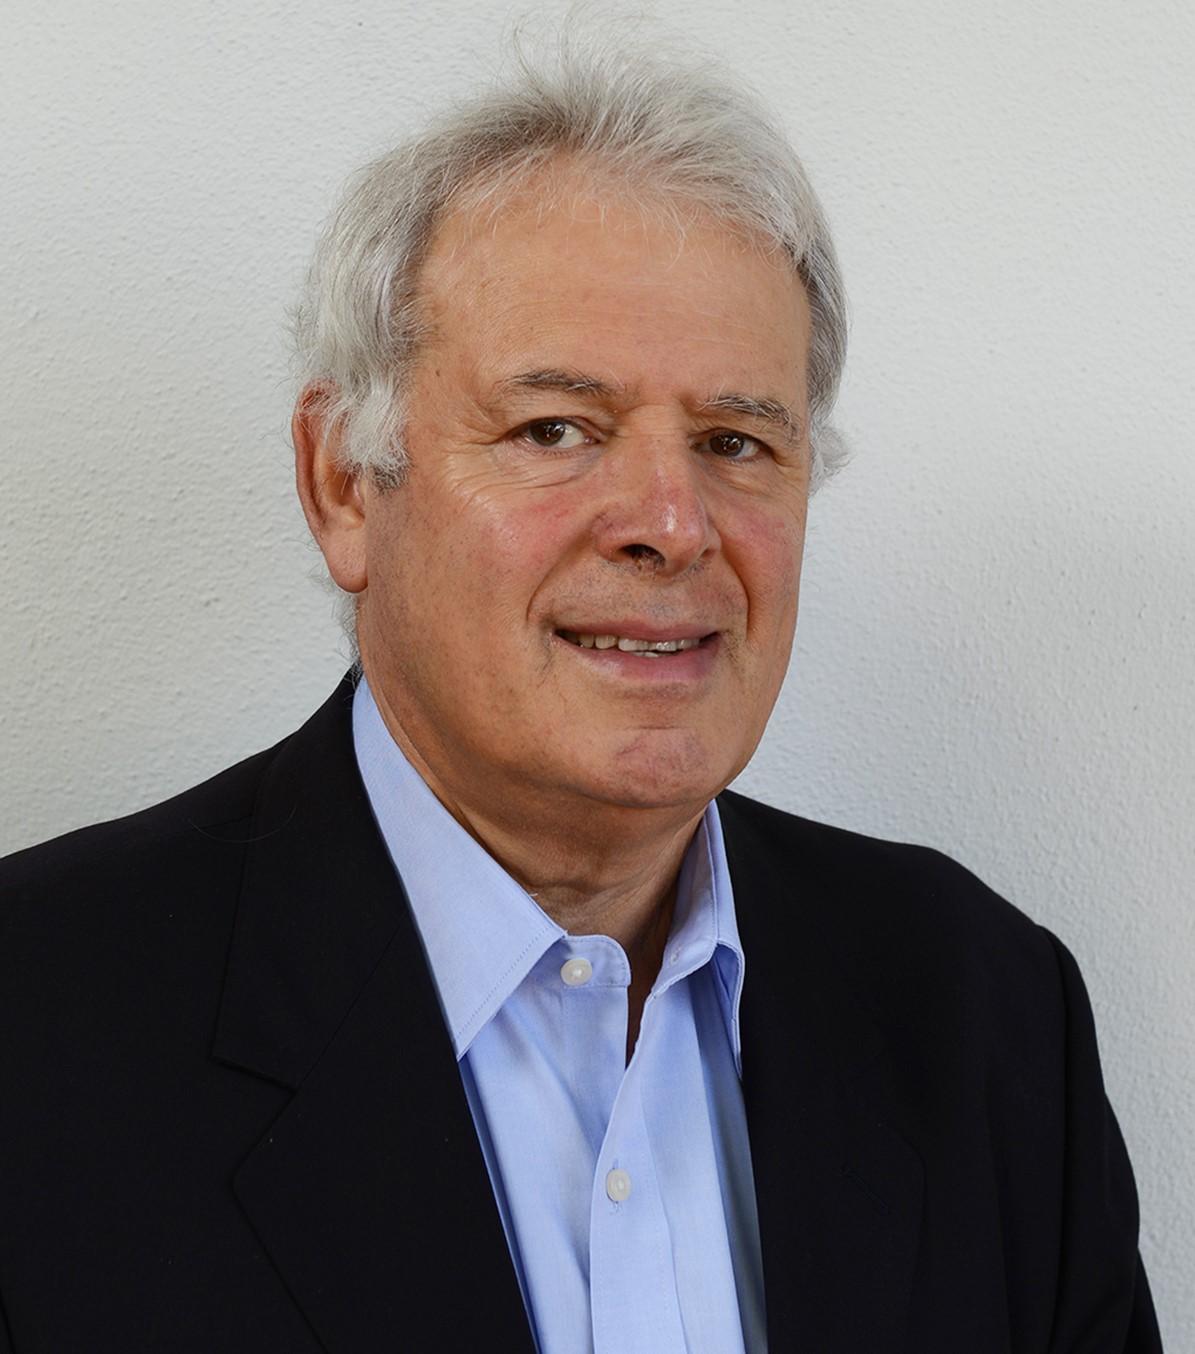 Professor Adam Graycar